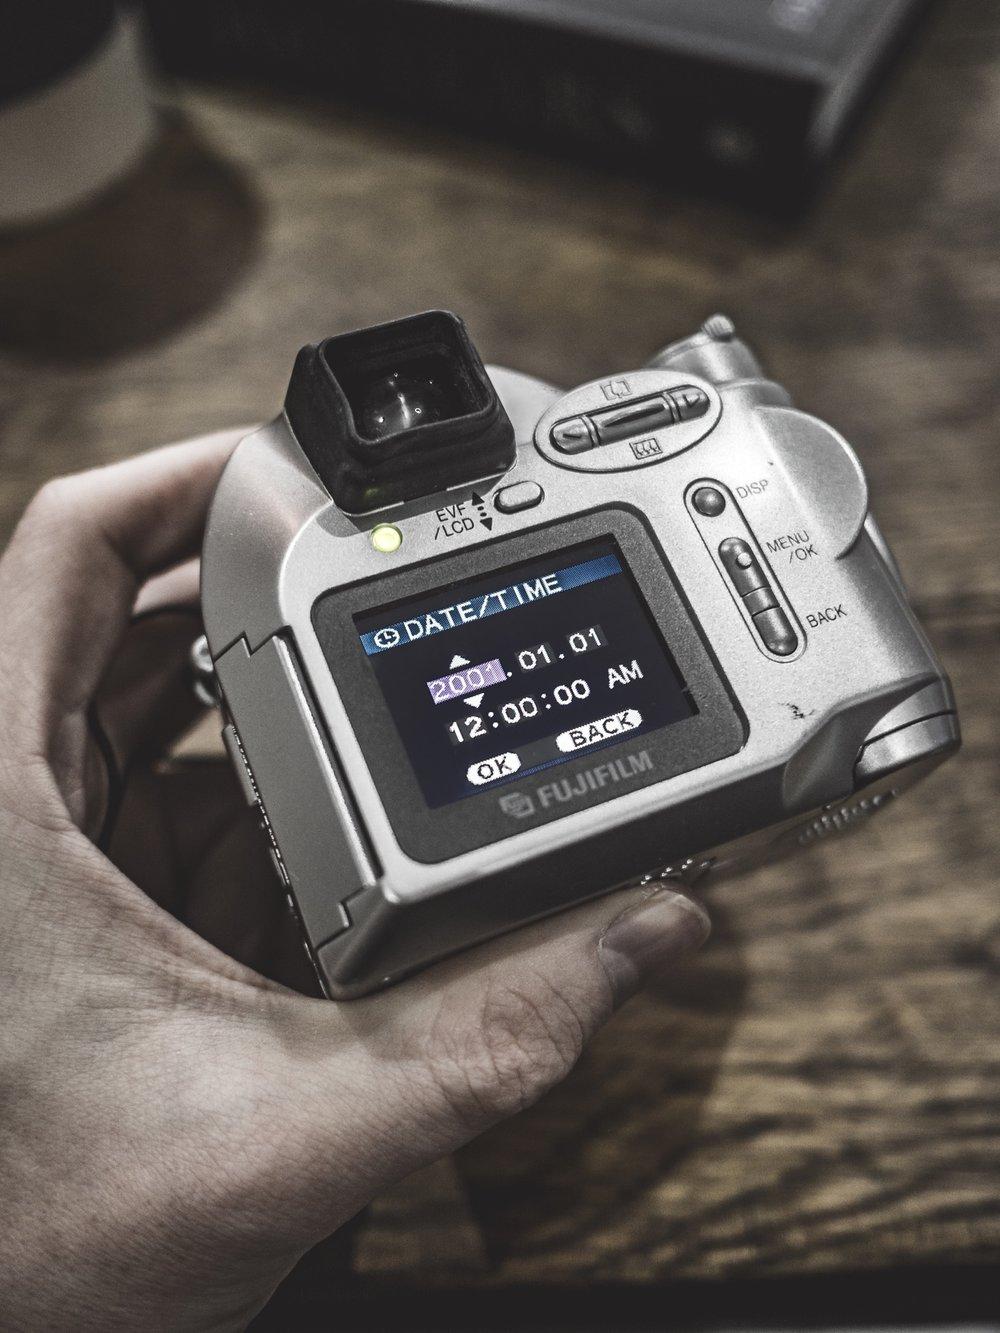 Fujifilm Finepix 2800 Zoom compact camera review